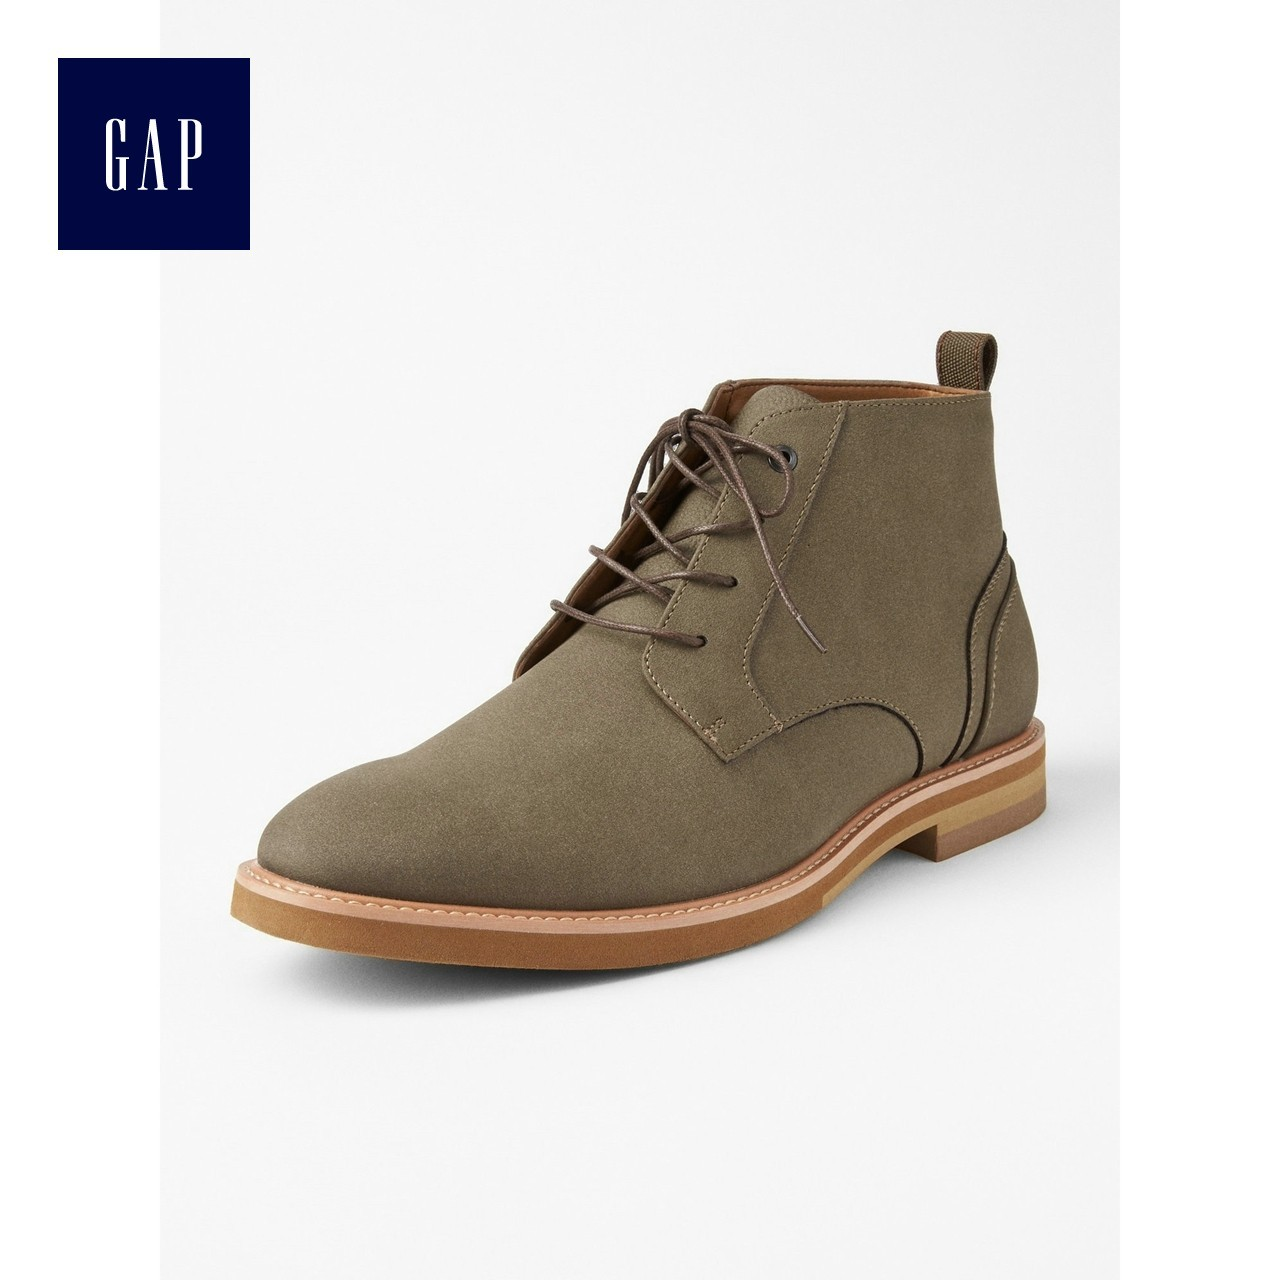 GAP 盖璞 329195 男士短靴 349元